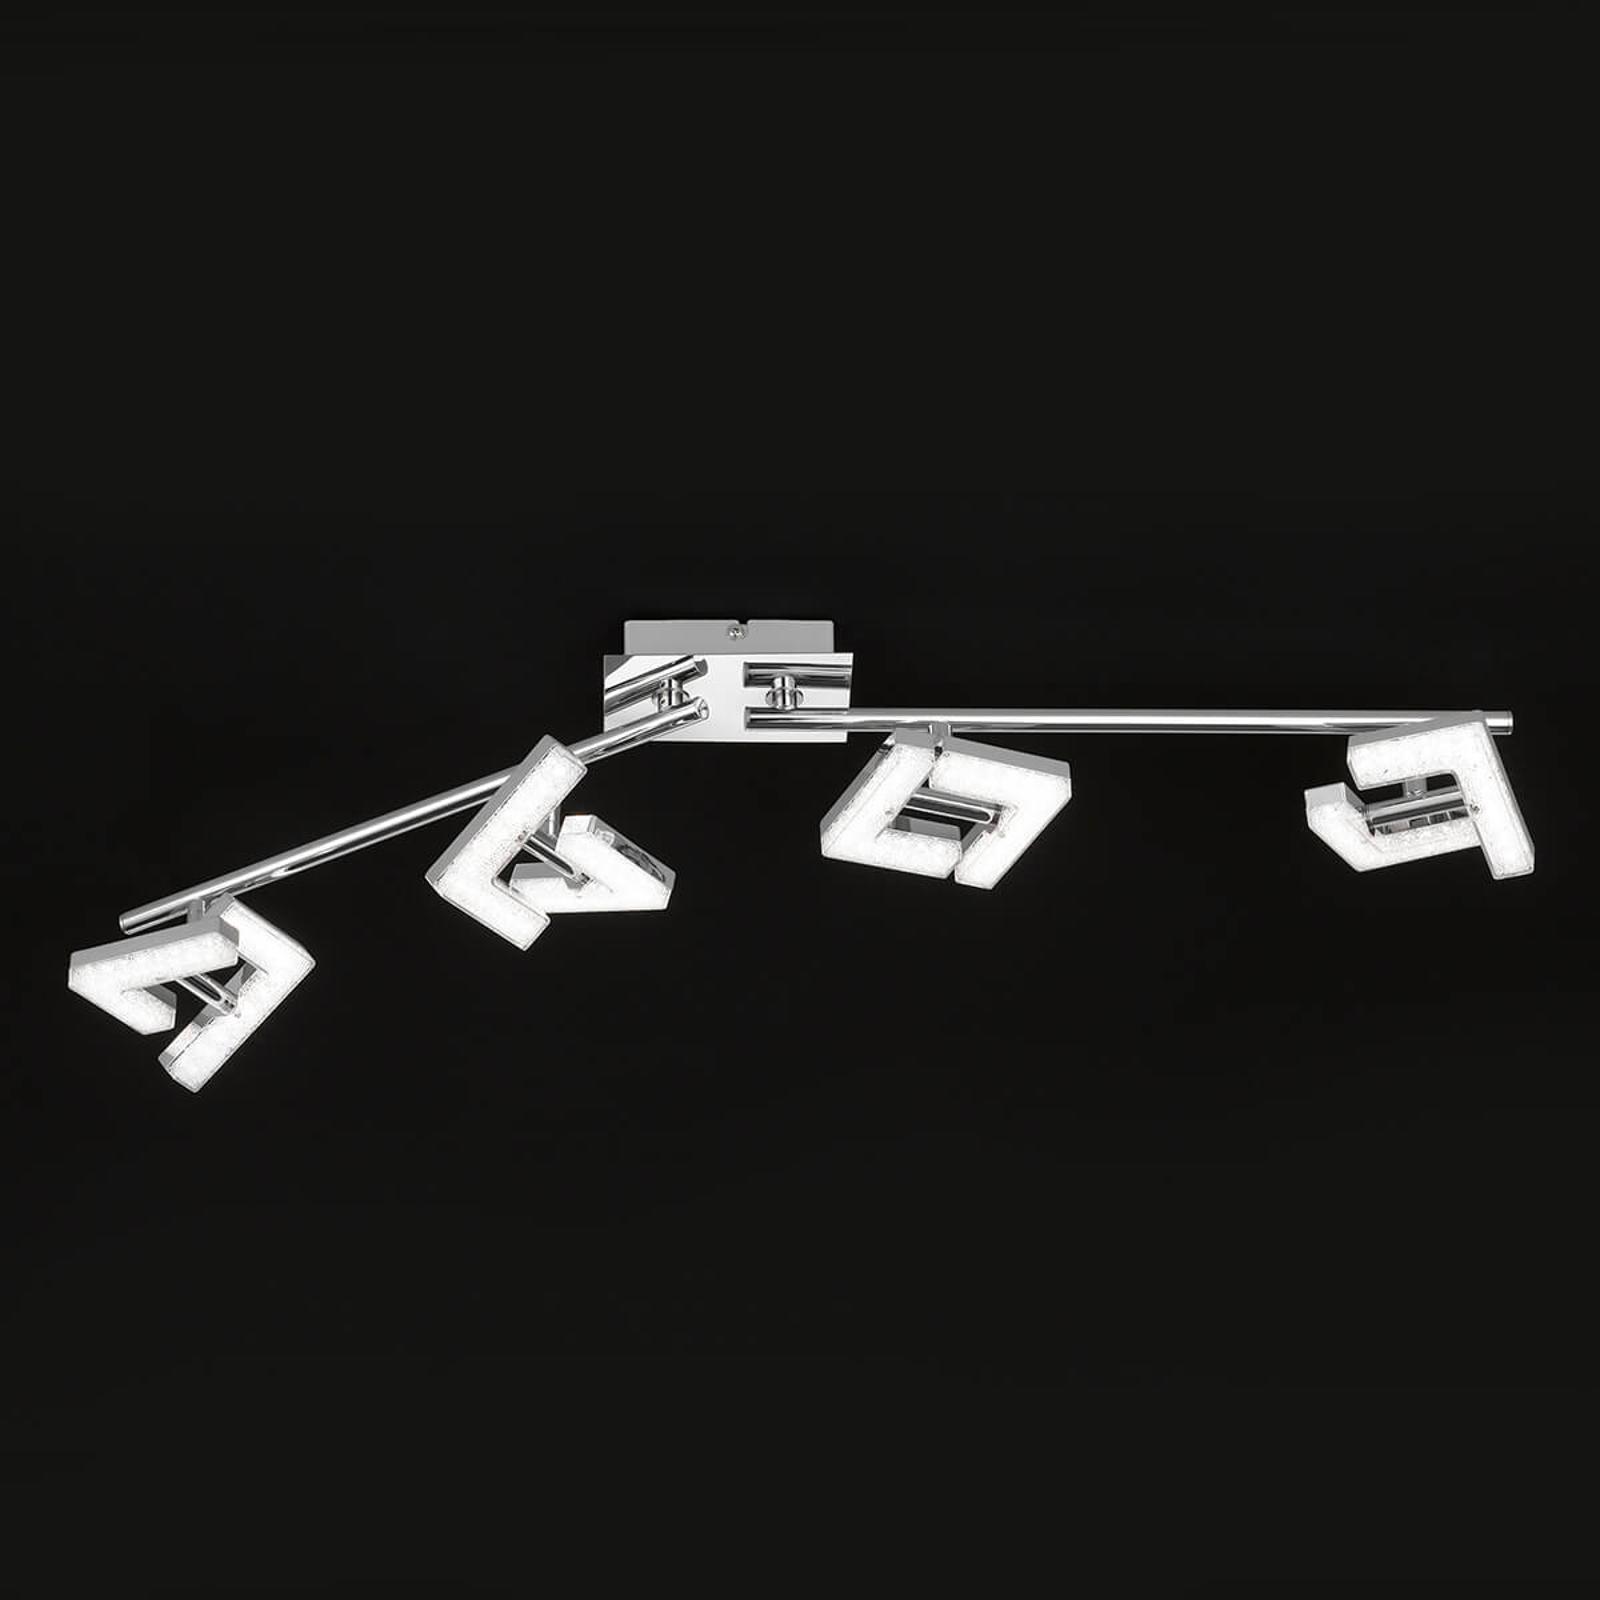 Lampa sufitowa LED Lea regulowana